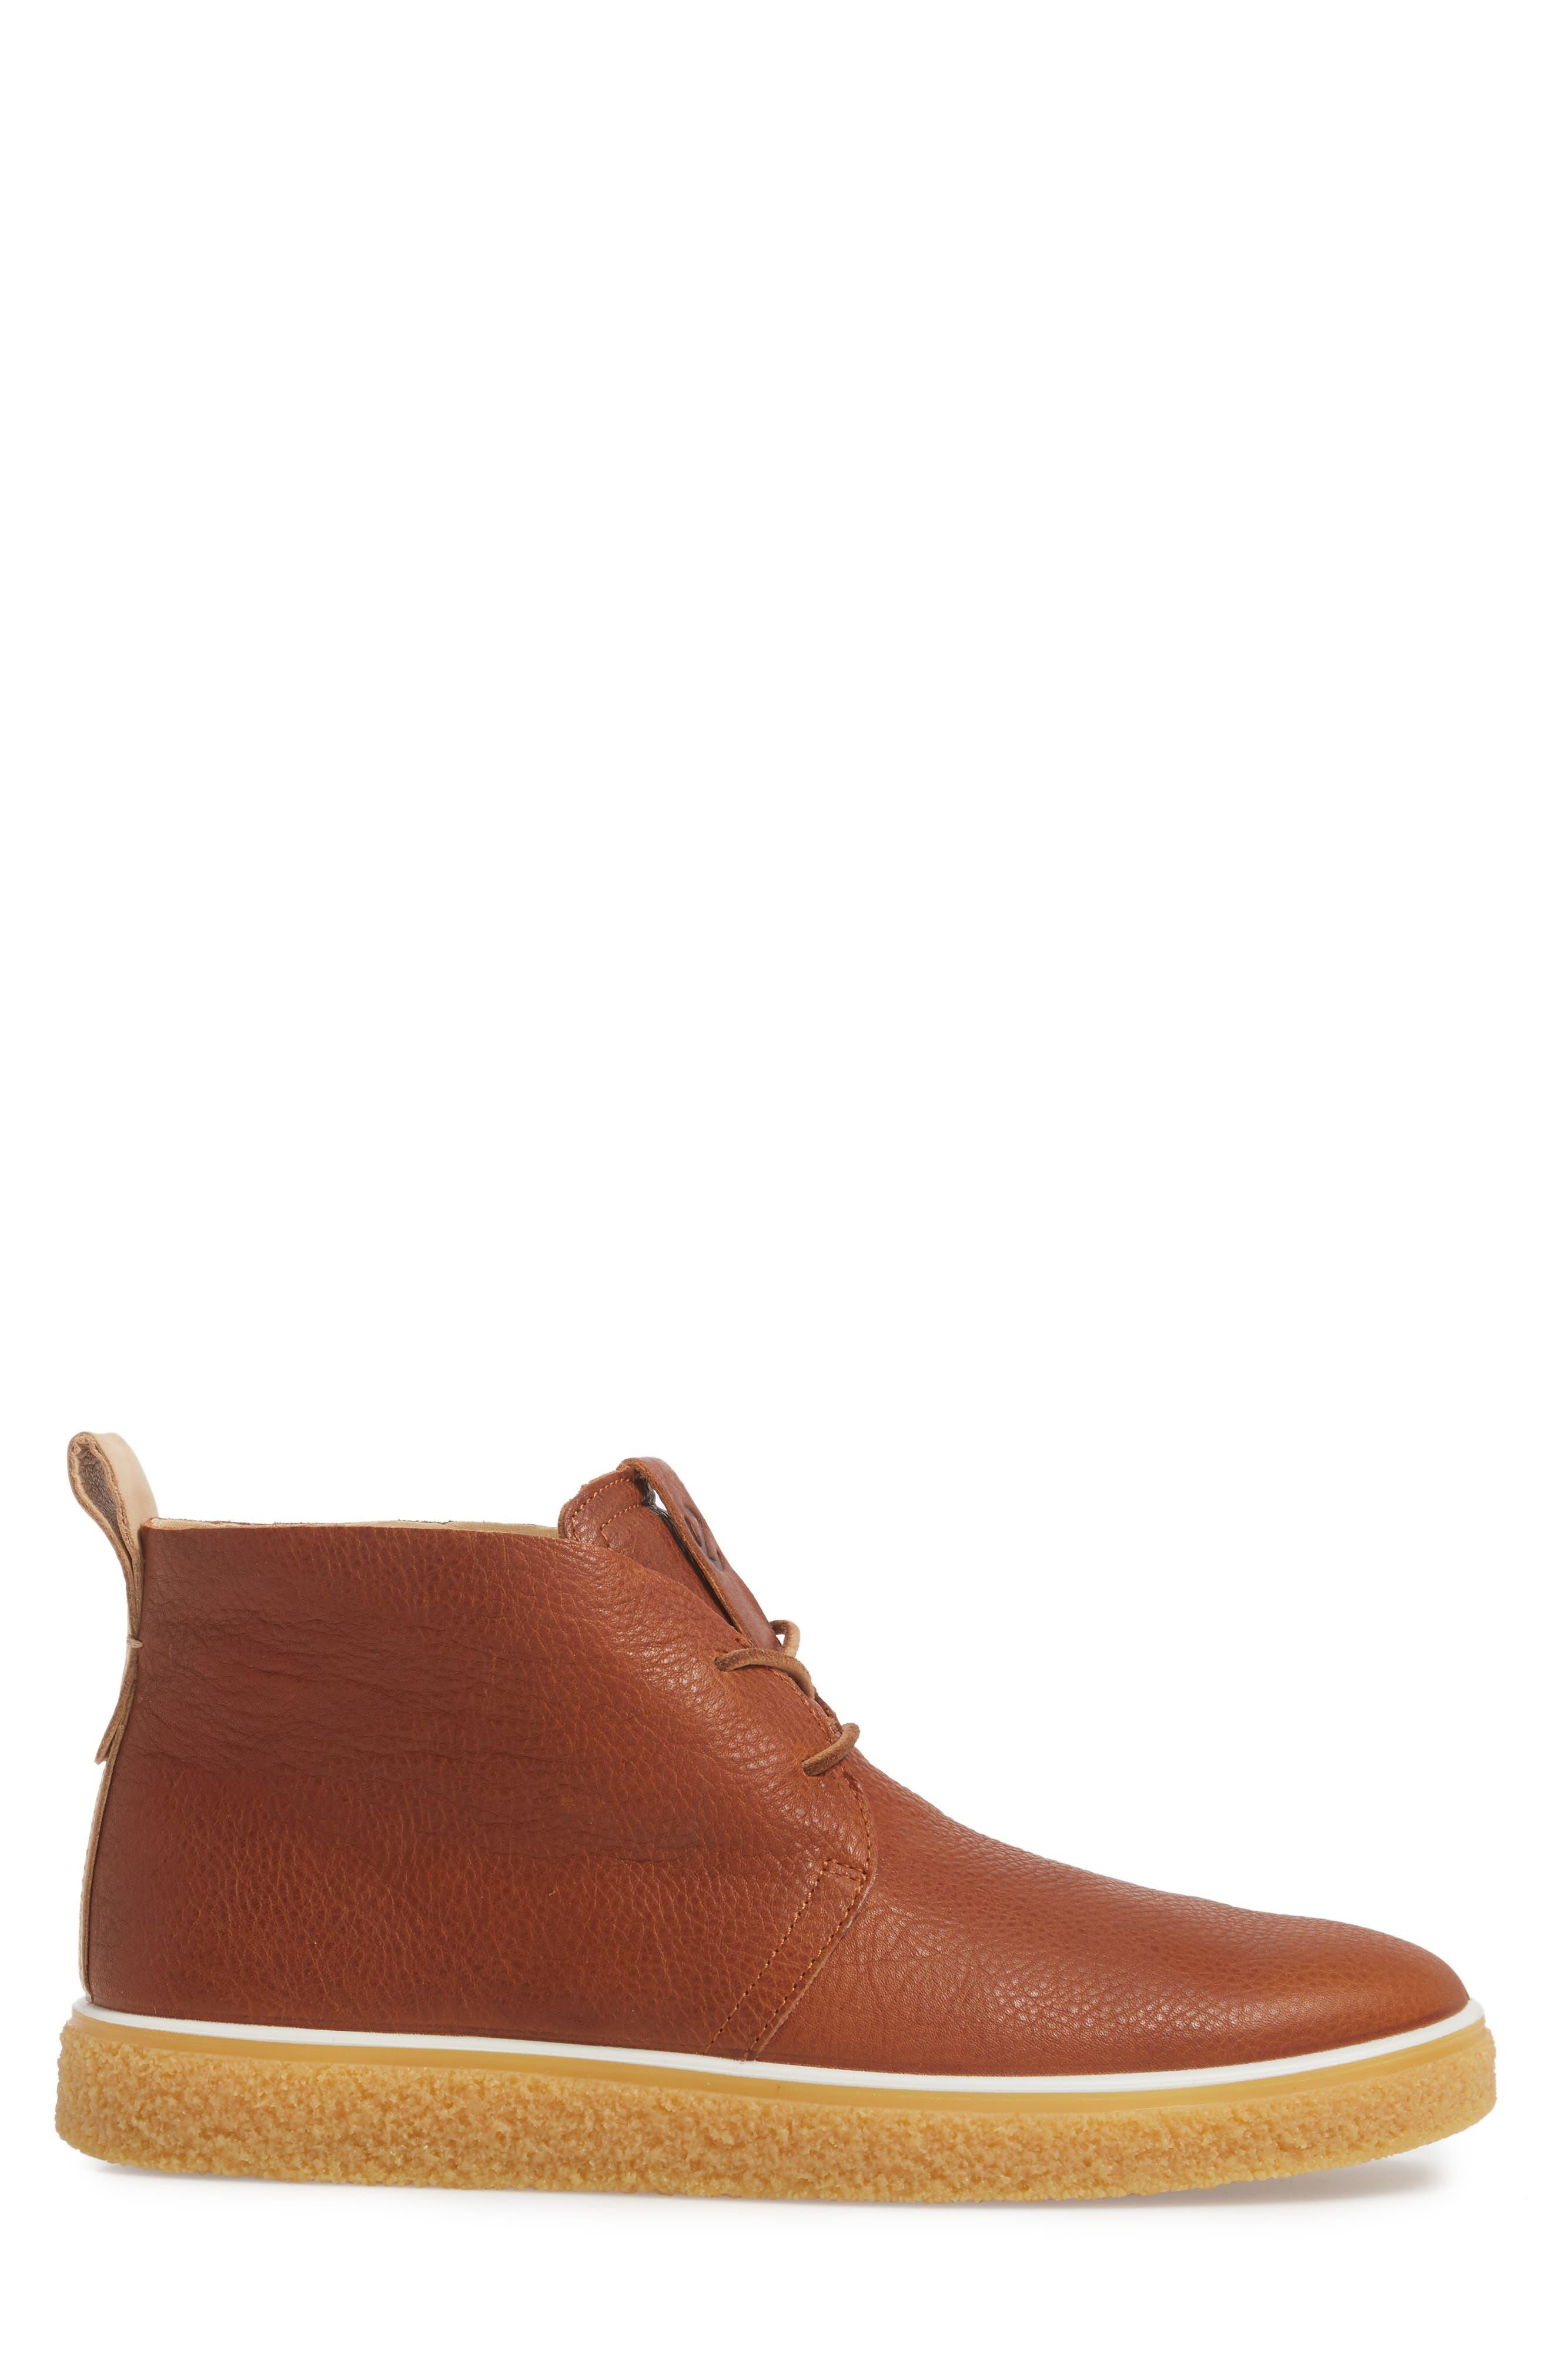 Crepetray Chukka Boot,                             Alternate thumbnail 3, color,                             Lion Leather